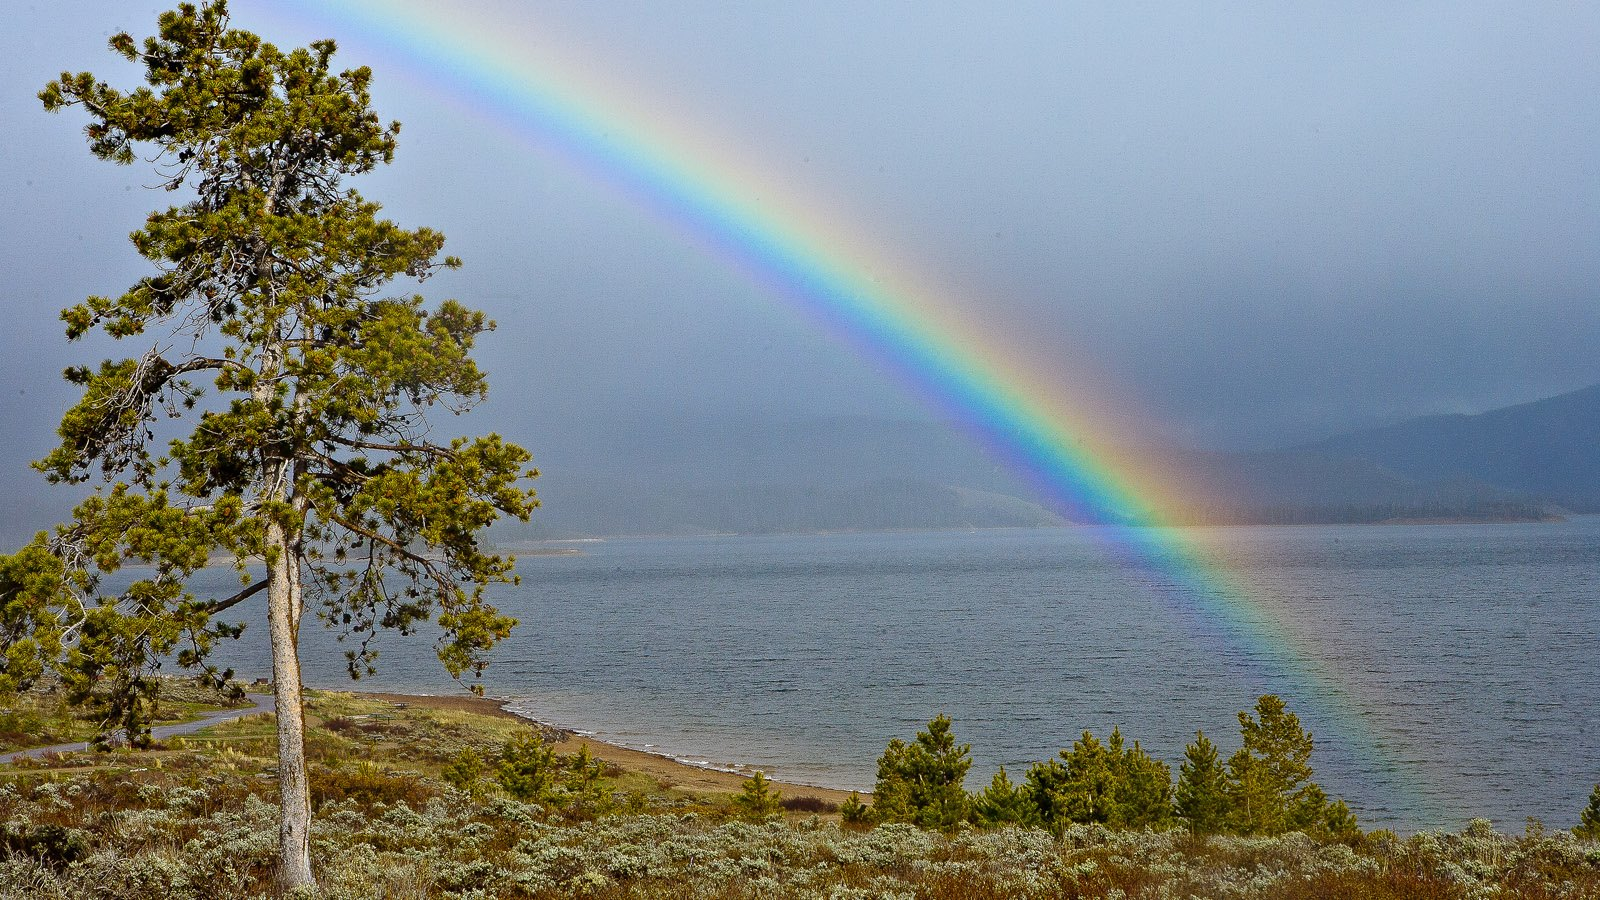 Rainbows are common